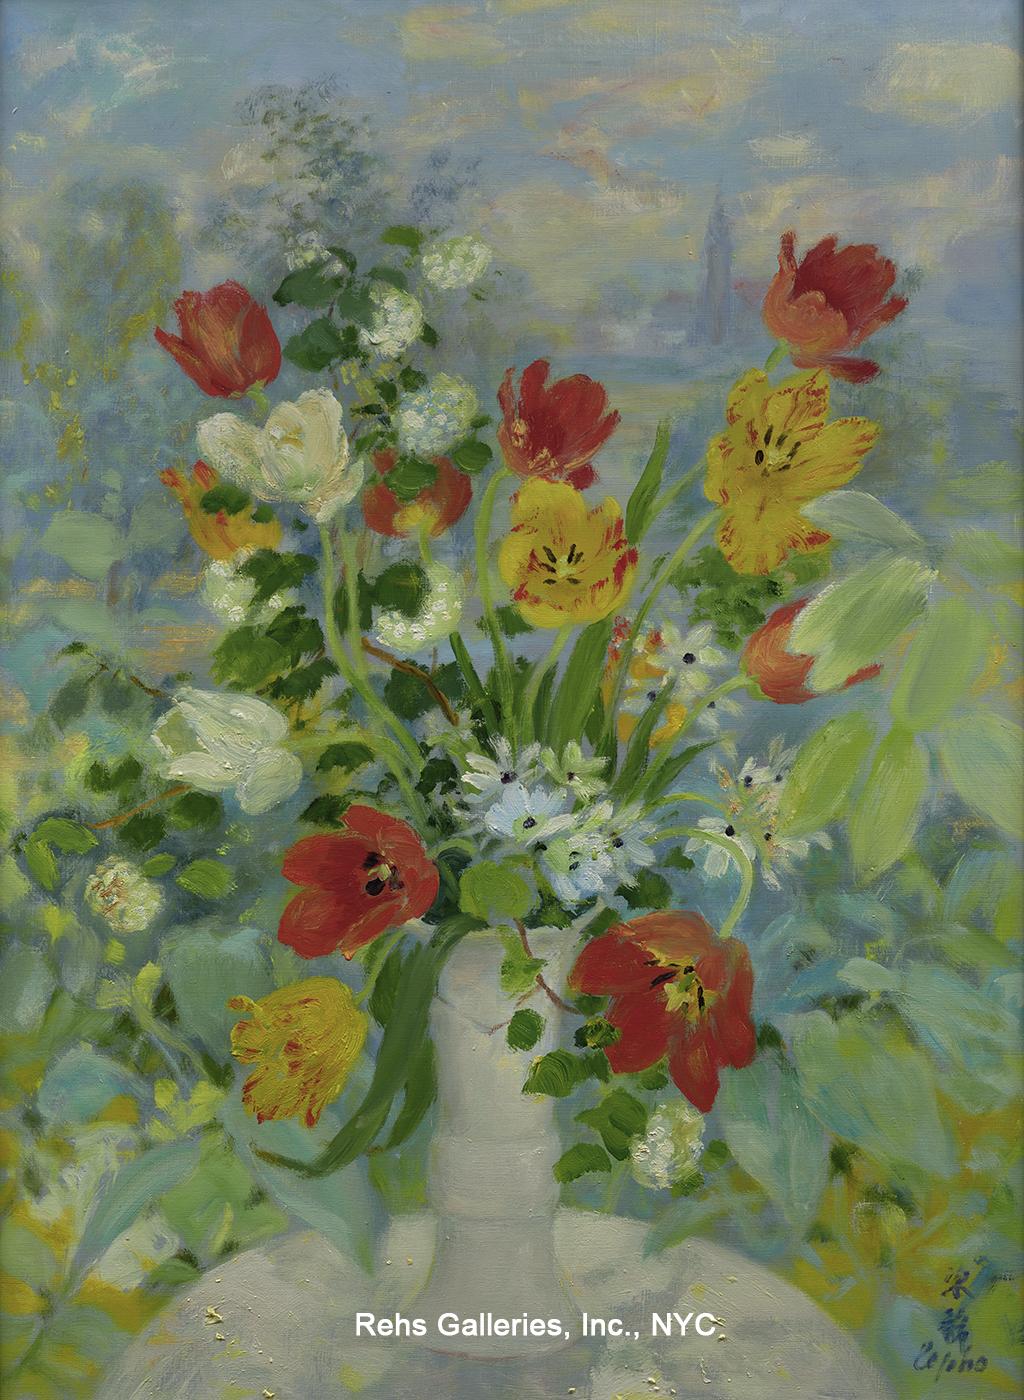 le_pho_e1384_les_tulipes_wm.jpg